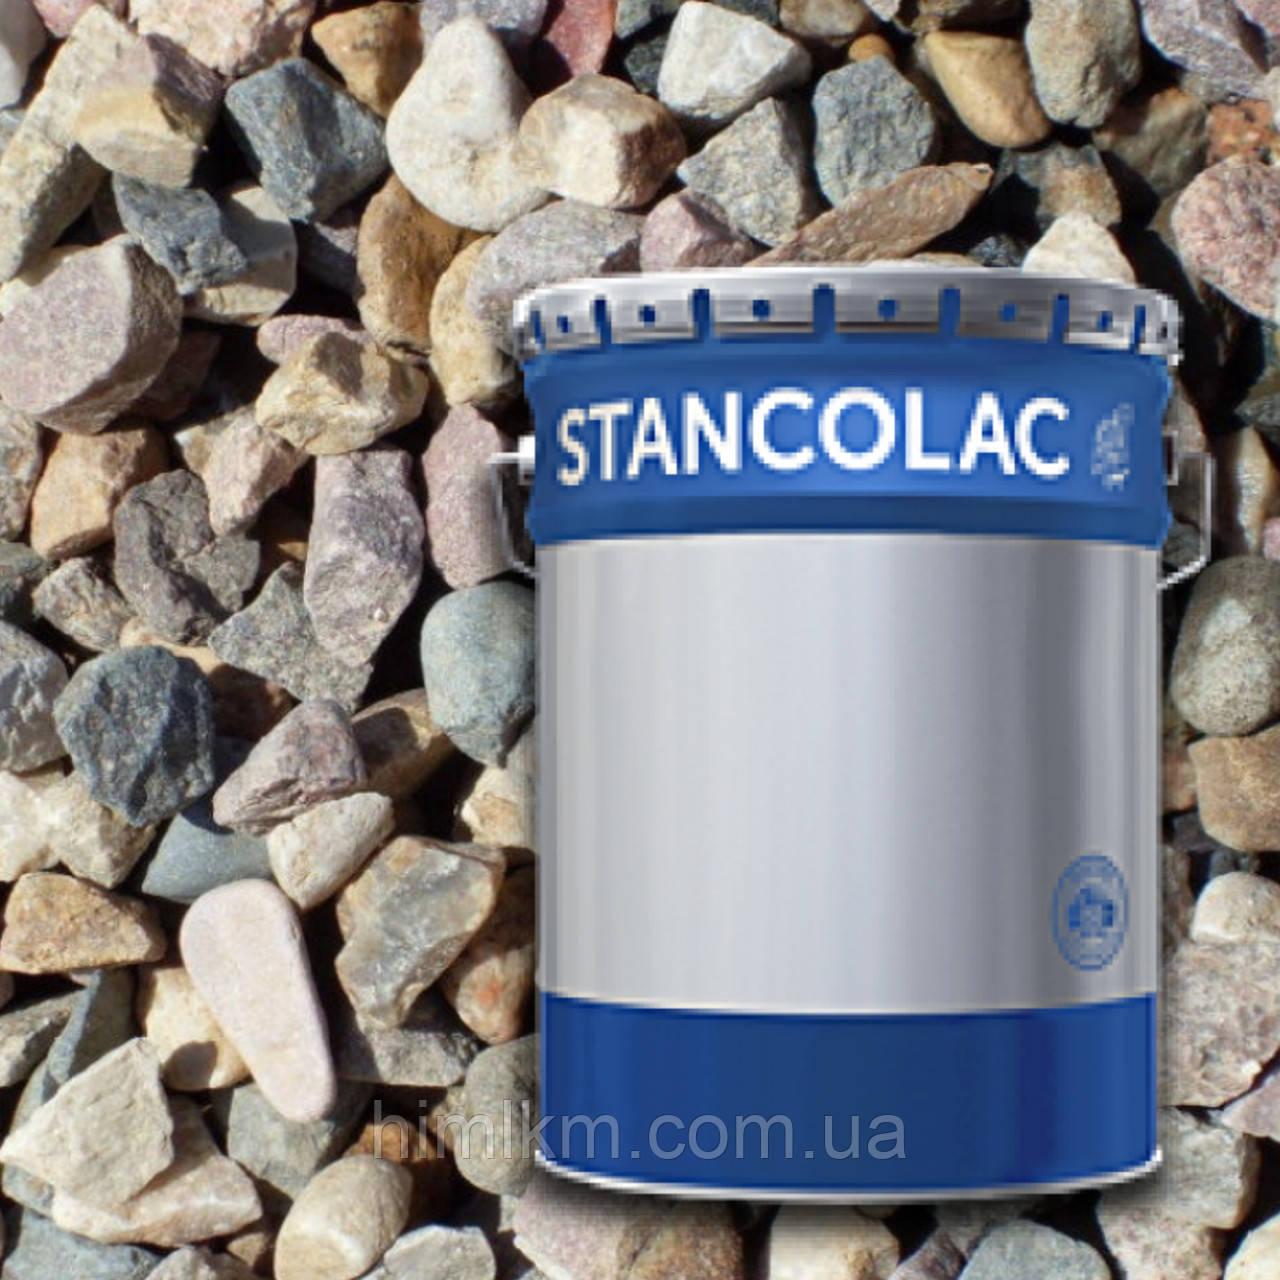 Краска для бетонных полов, камня, щебня, нанесения разметки Станколак 555 Stancoroad